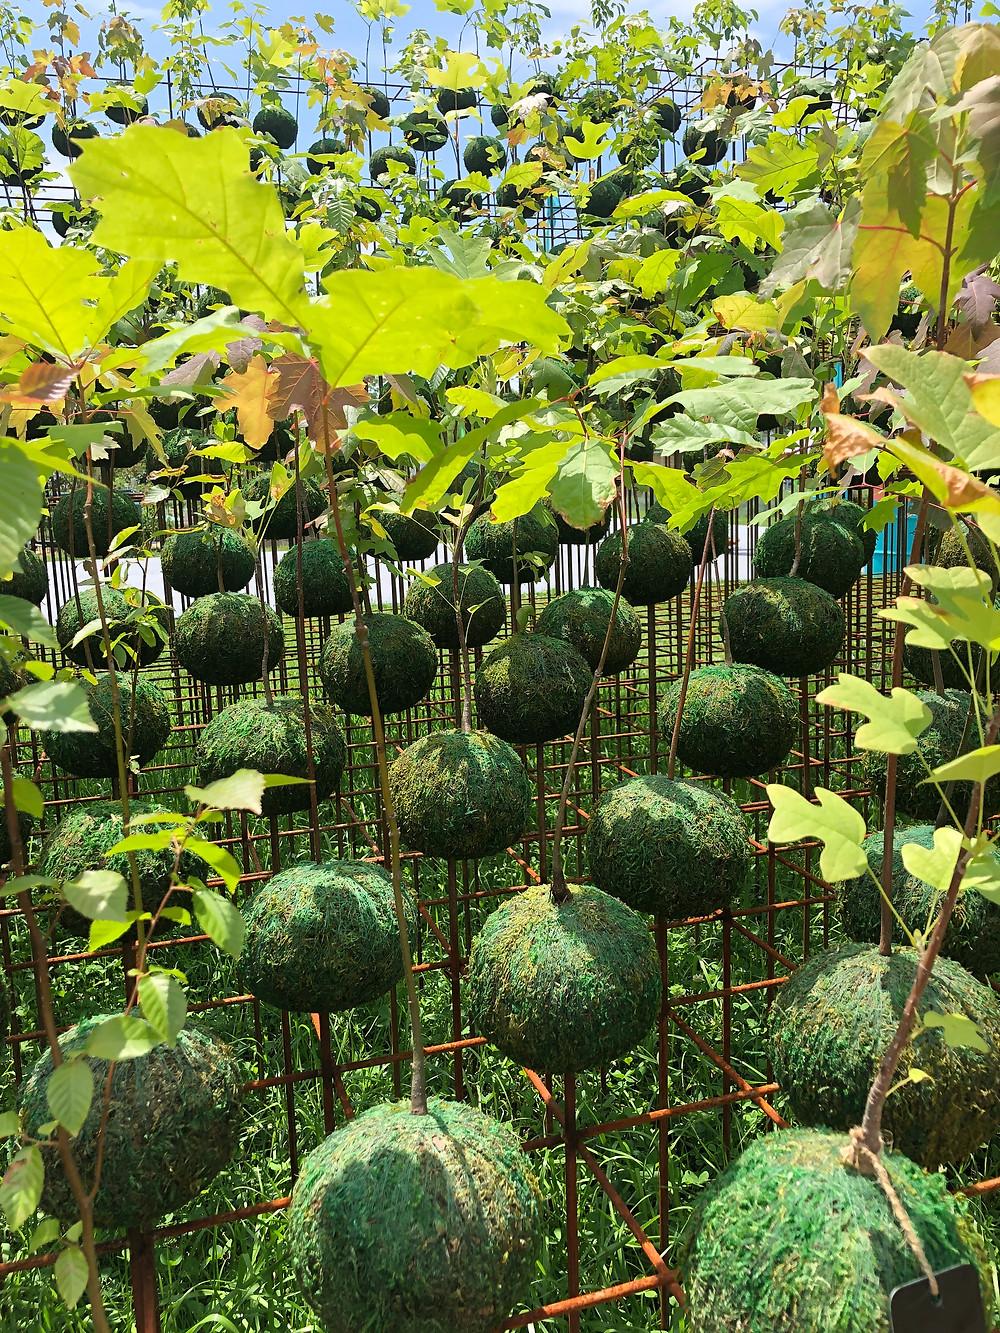 native tree saplings in kokedama